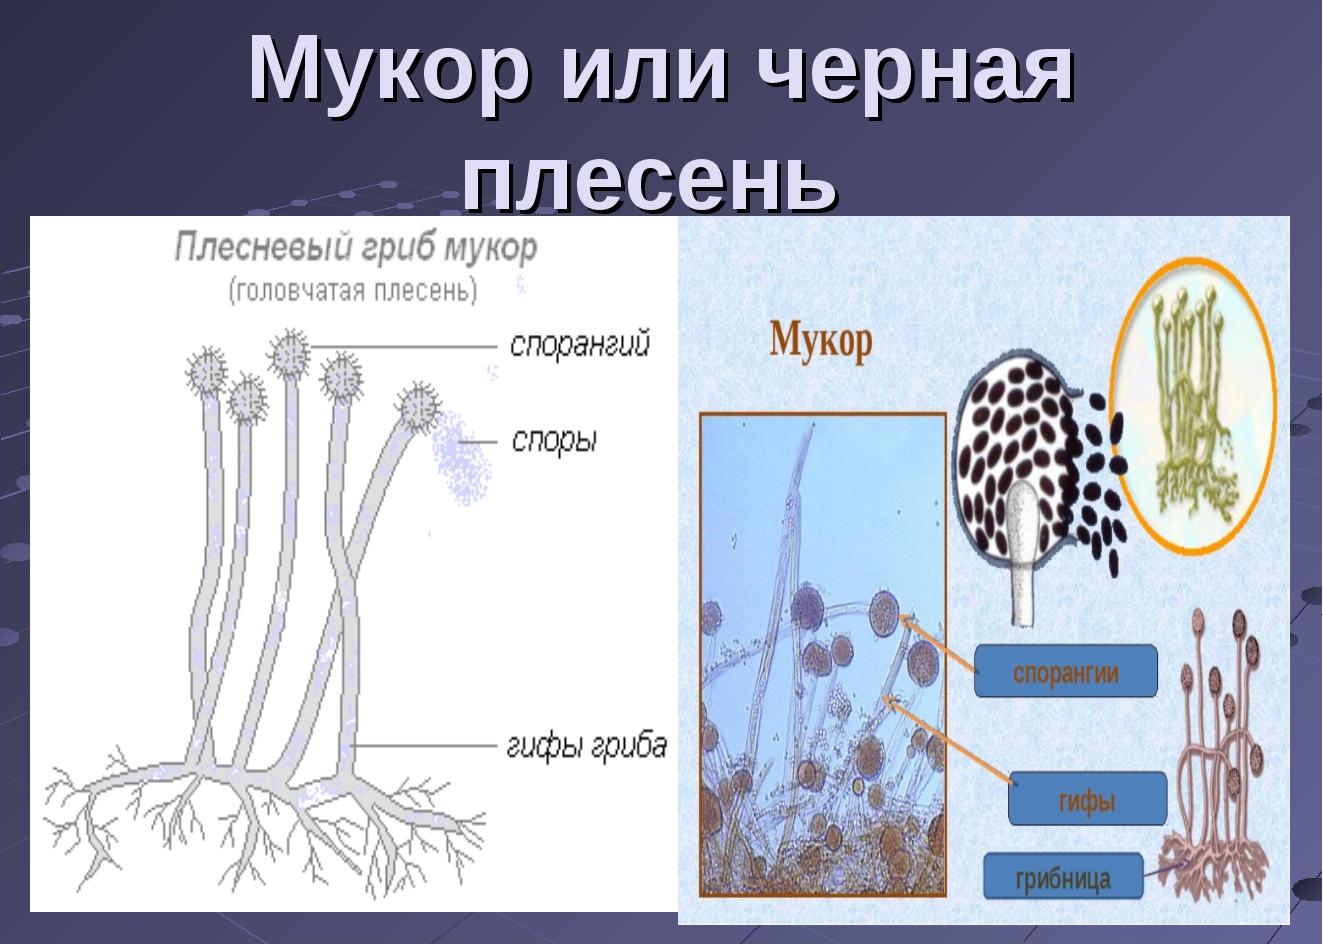 картинки гриба мукор каталоге можно ознакомиться